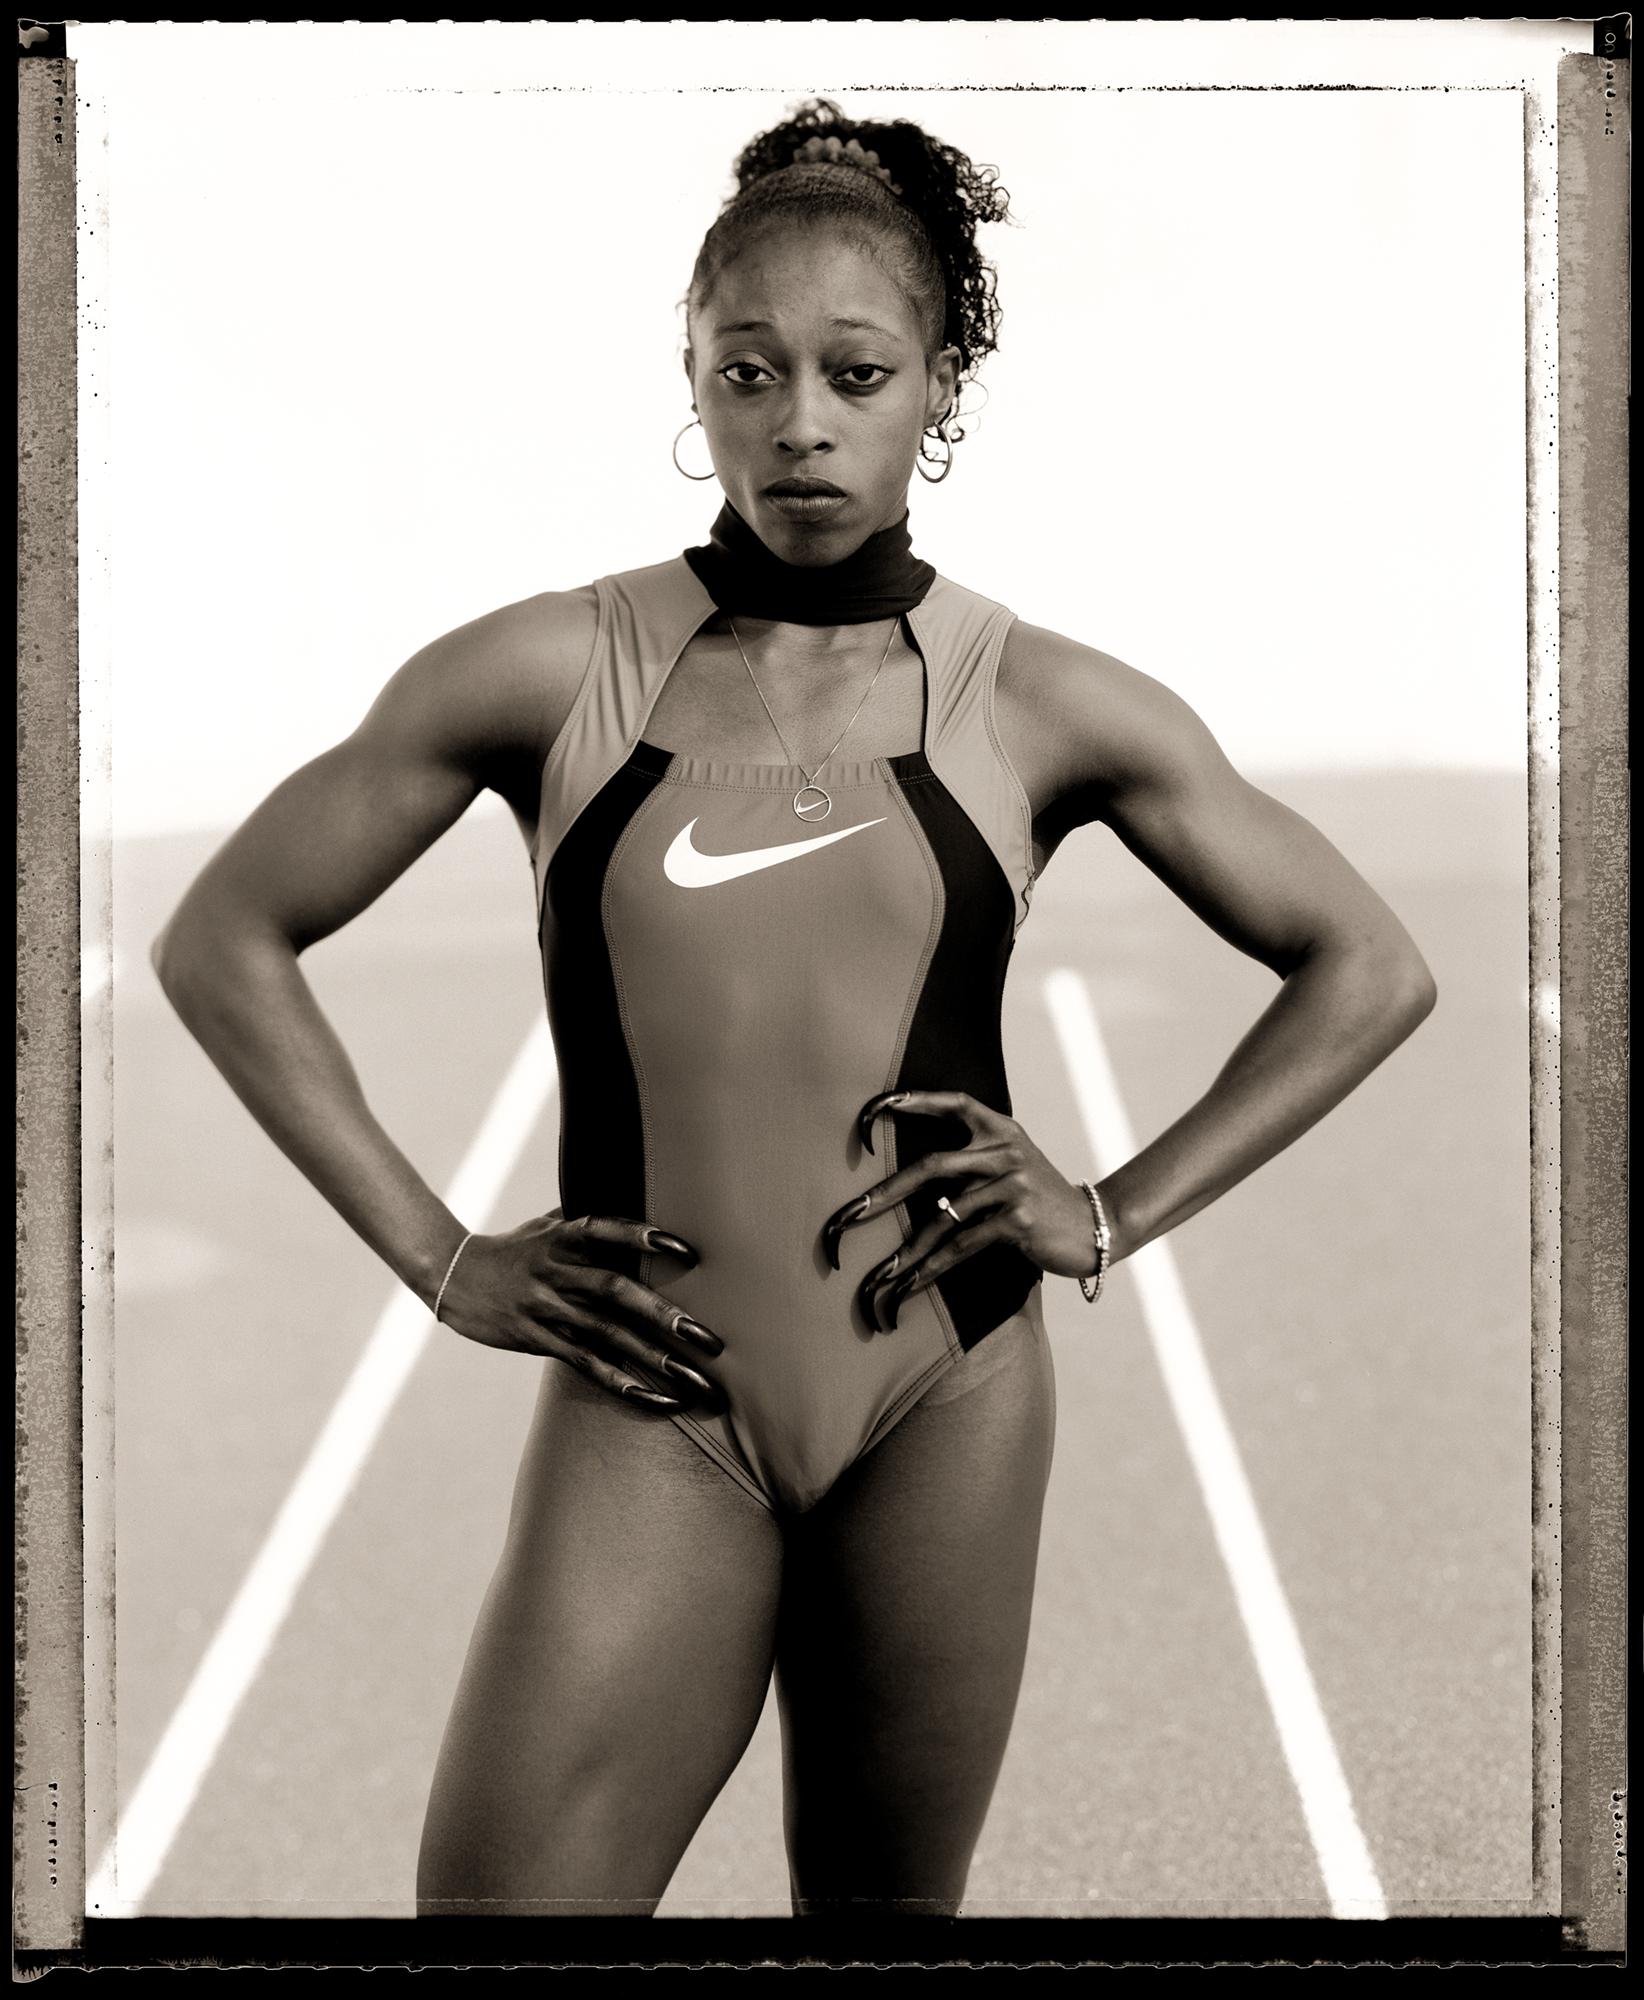 Gail Devers, 1996